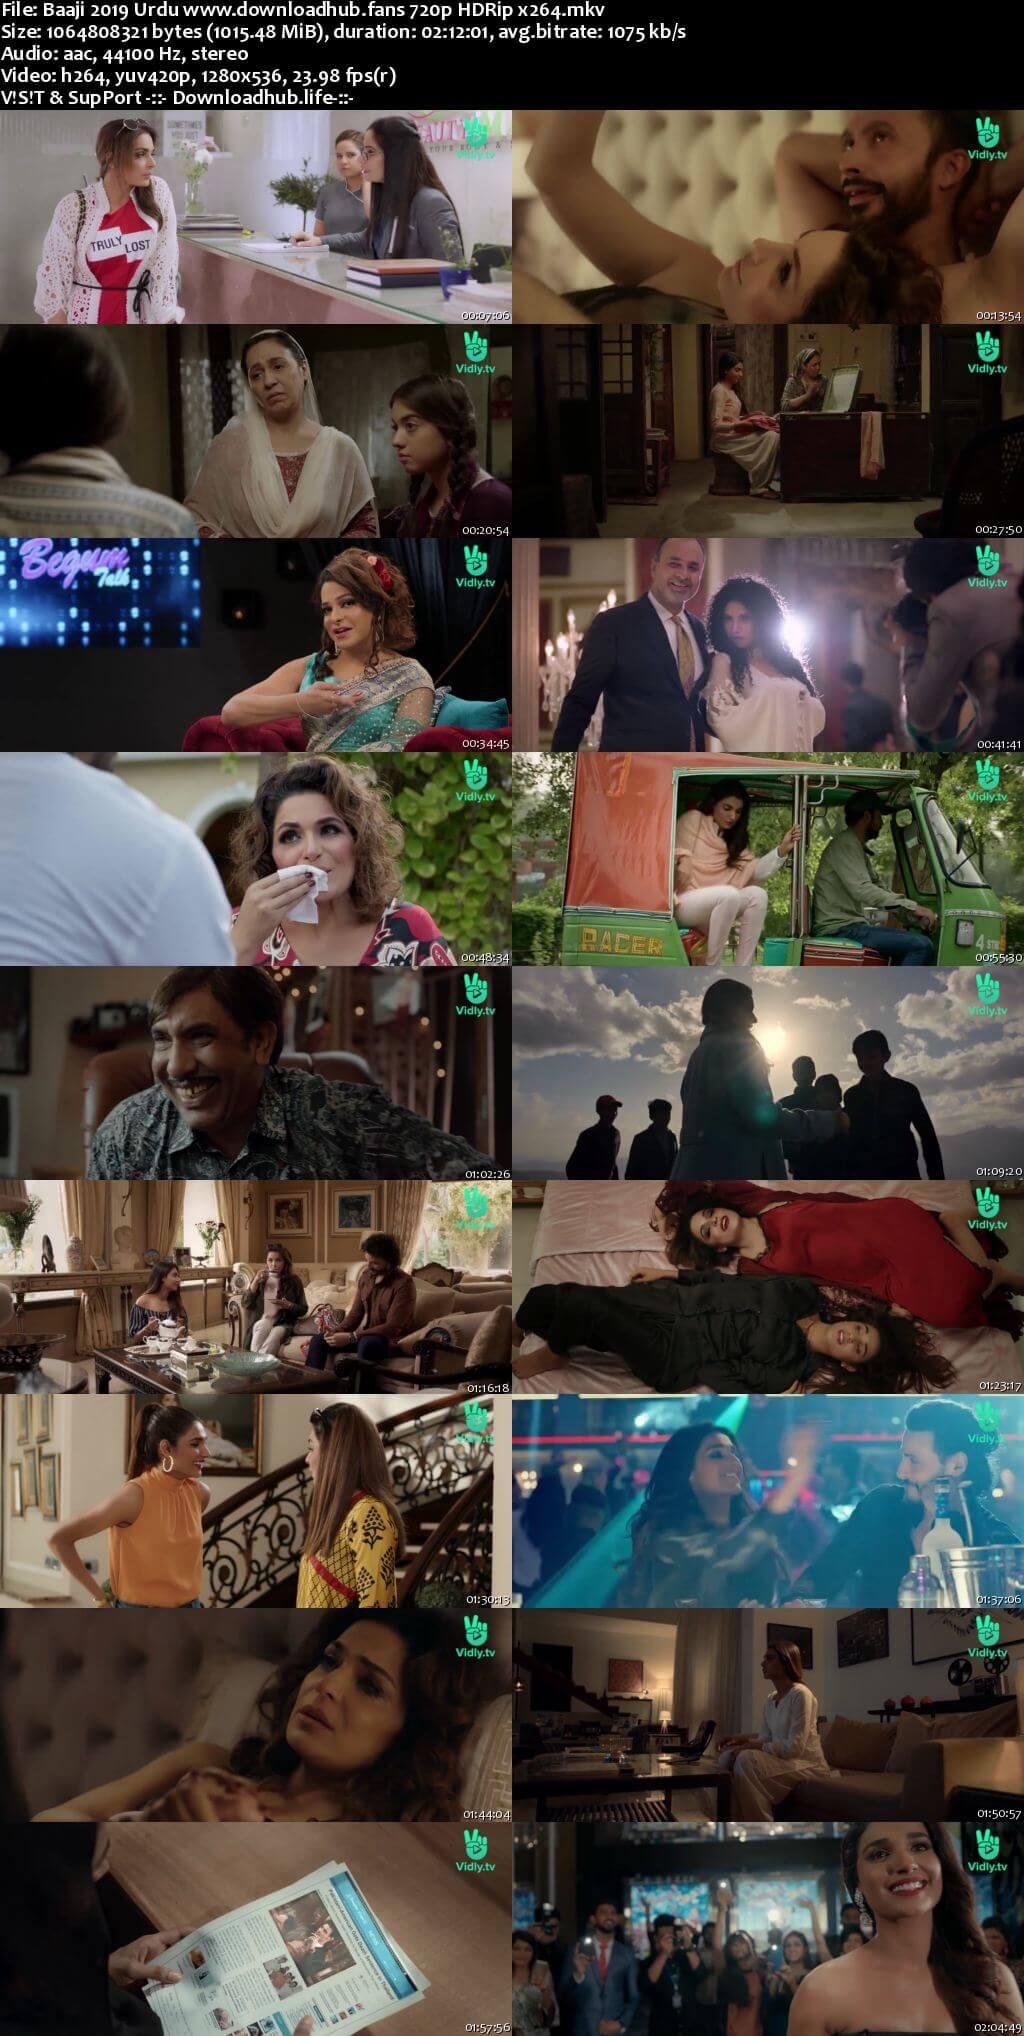 Baaji 2019 Urdu 720p HDRip x264